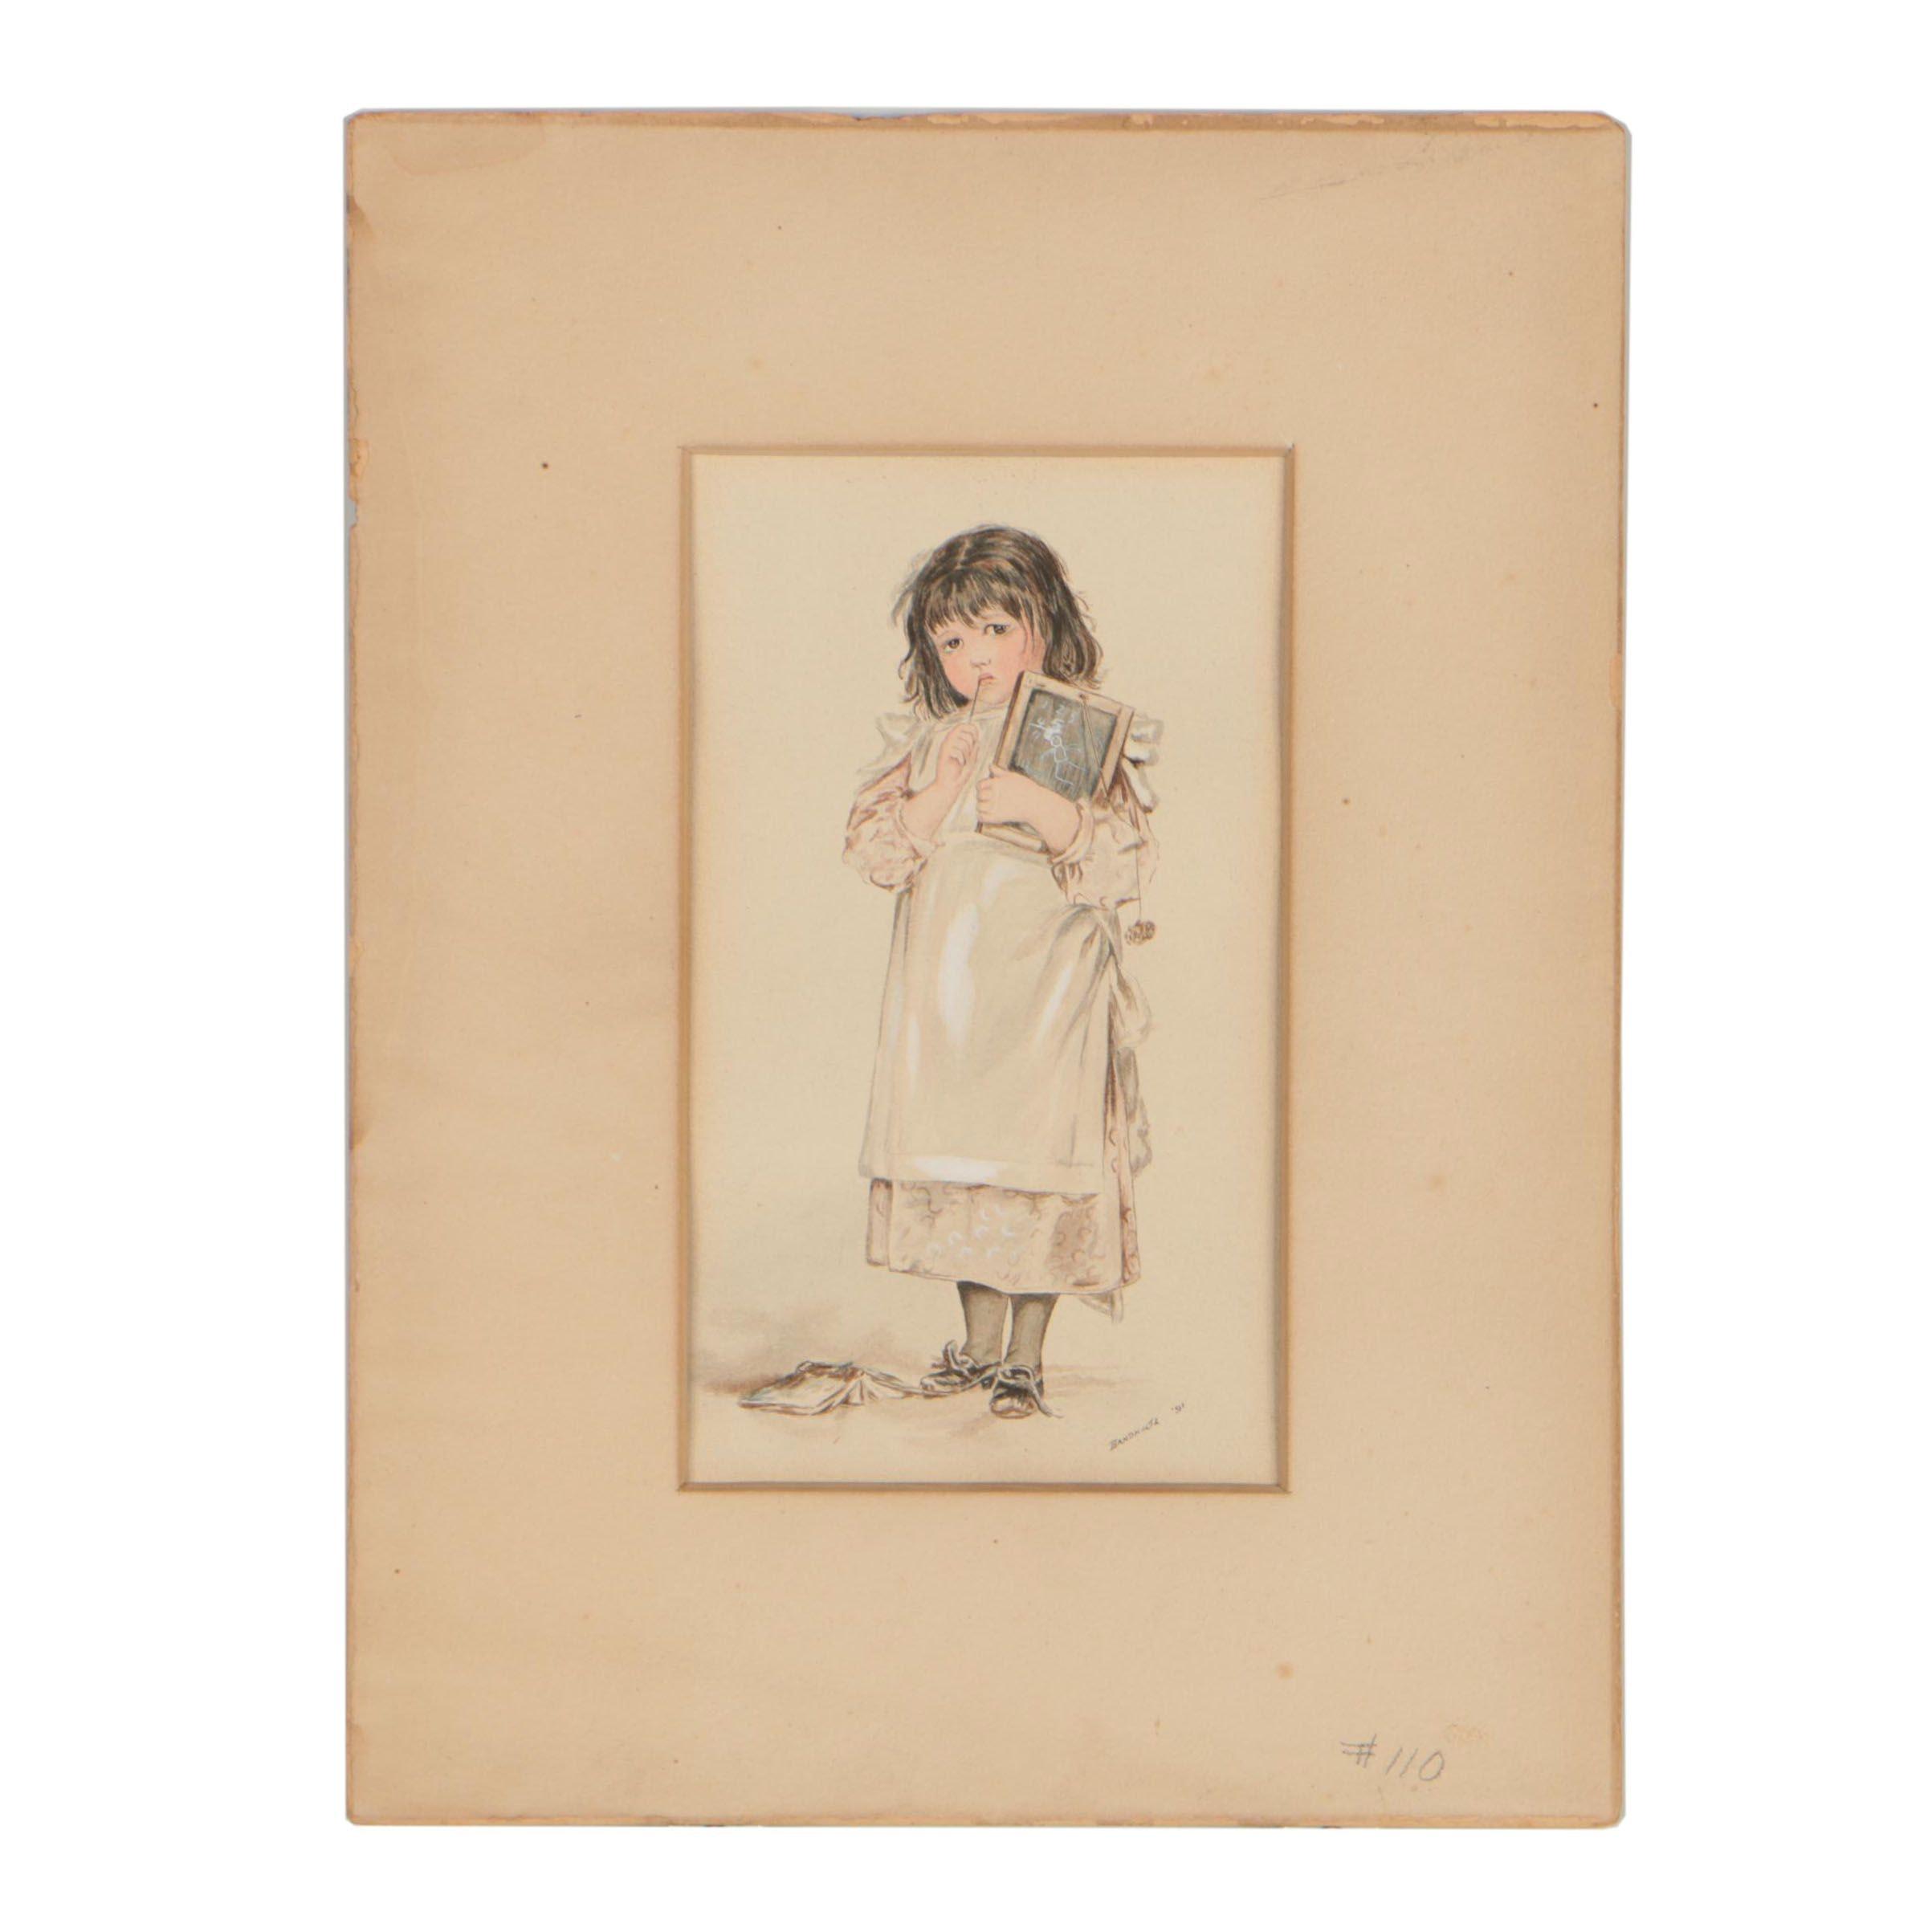 1891 Copy Watercolor Portrait after Frances Brundage Illustration